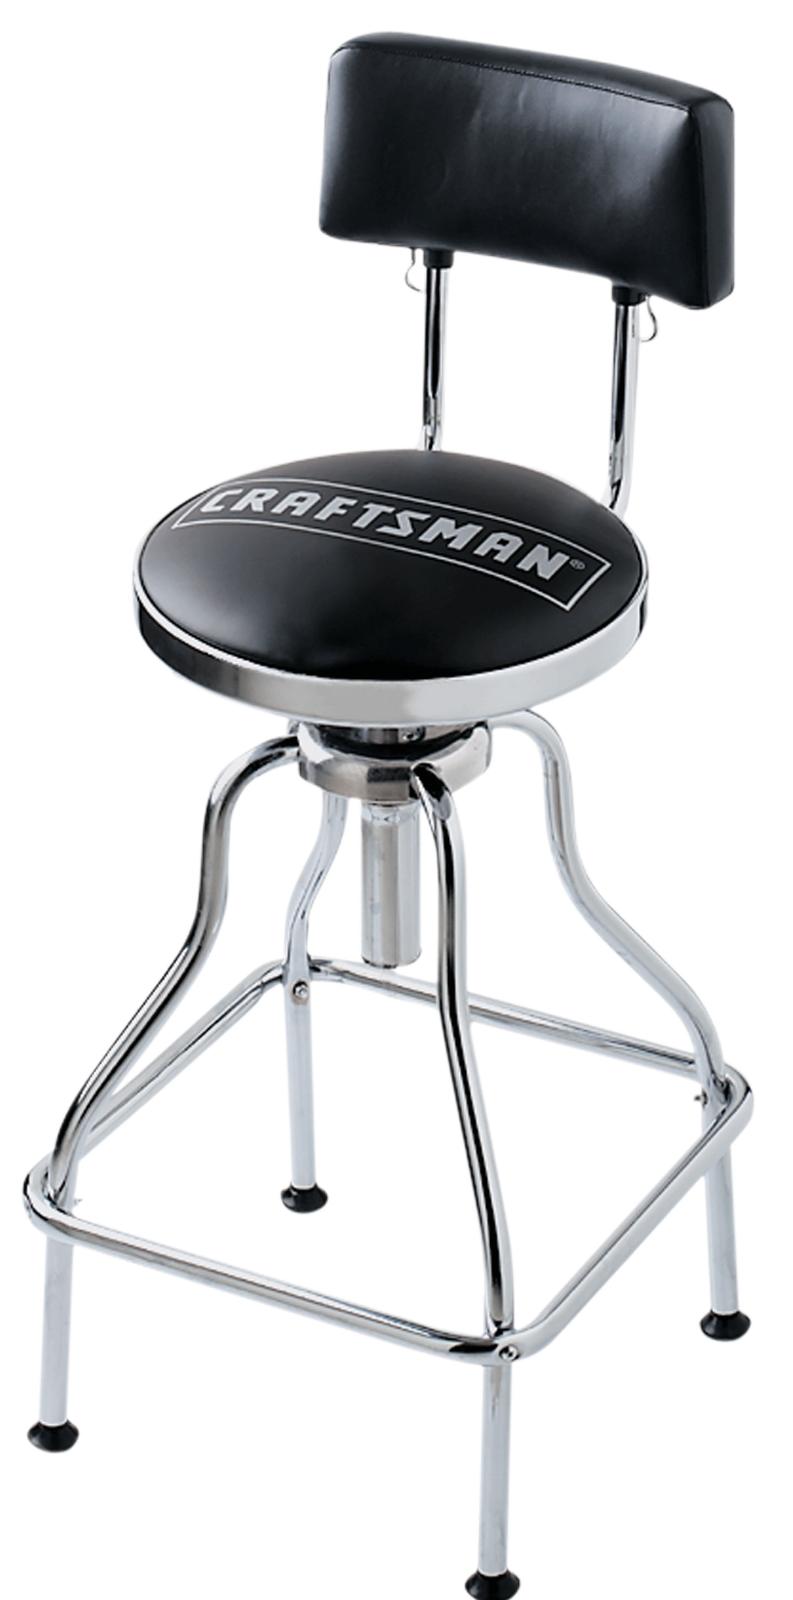 Craftsman Black Adjustable Hydraulic Seat New 49860 For